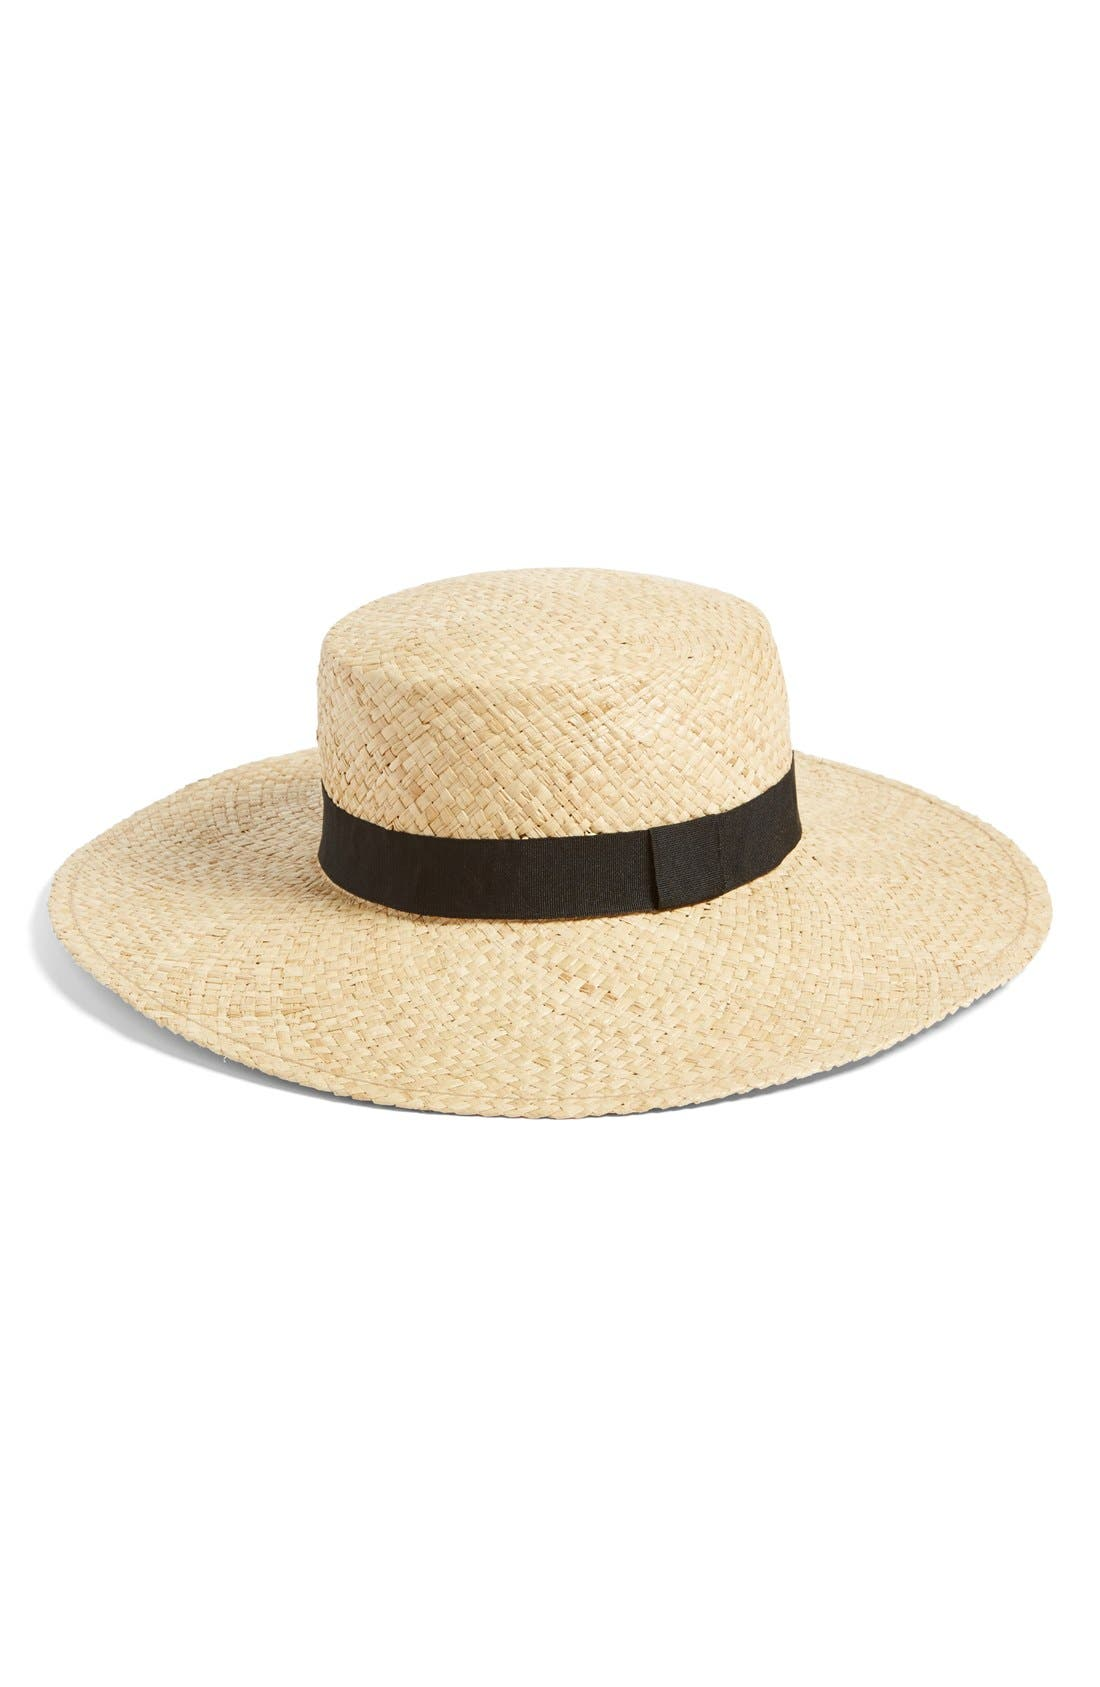 BP Wide Brim Raffia Boater Hat,                             Main thumbnail 1, color,                             235